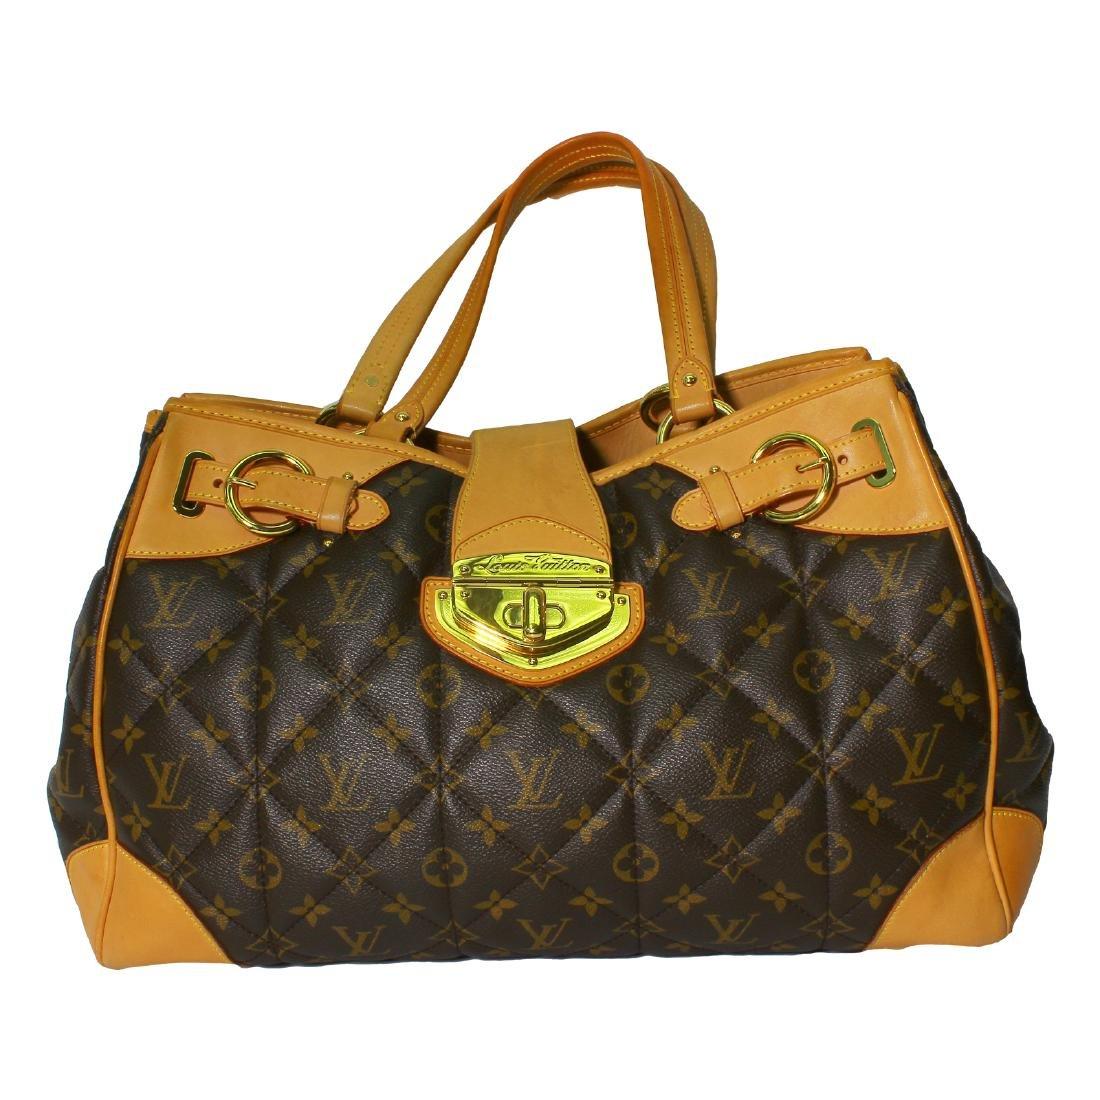 Louis Vuitton Monogram Canvas Etoile Bag, Brown & Tan